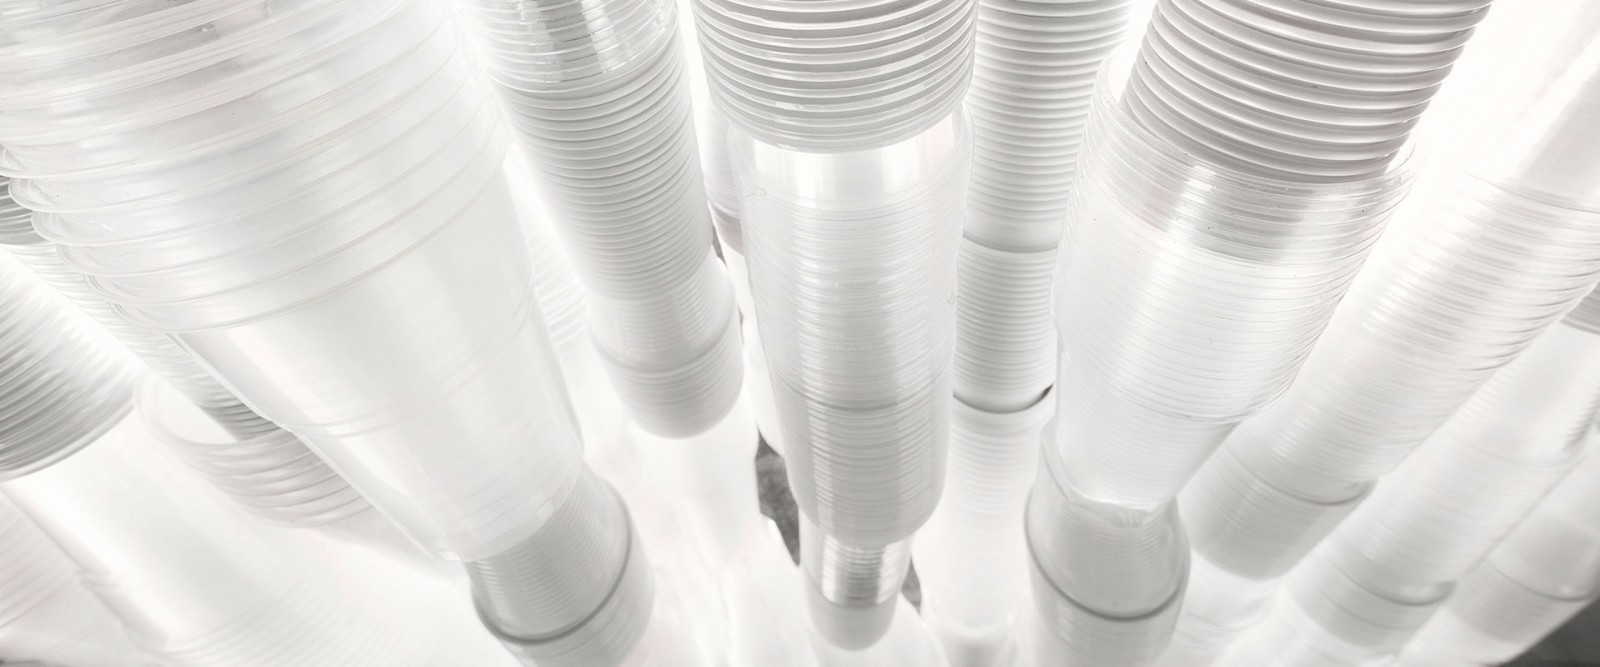 glasswall-francesca-pasquali-plastic-cups-cubo-unipol